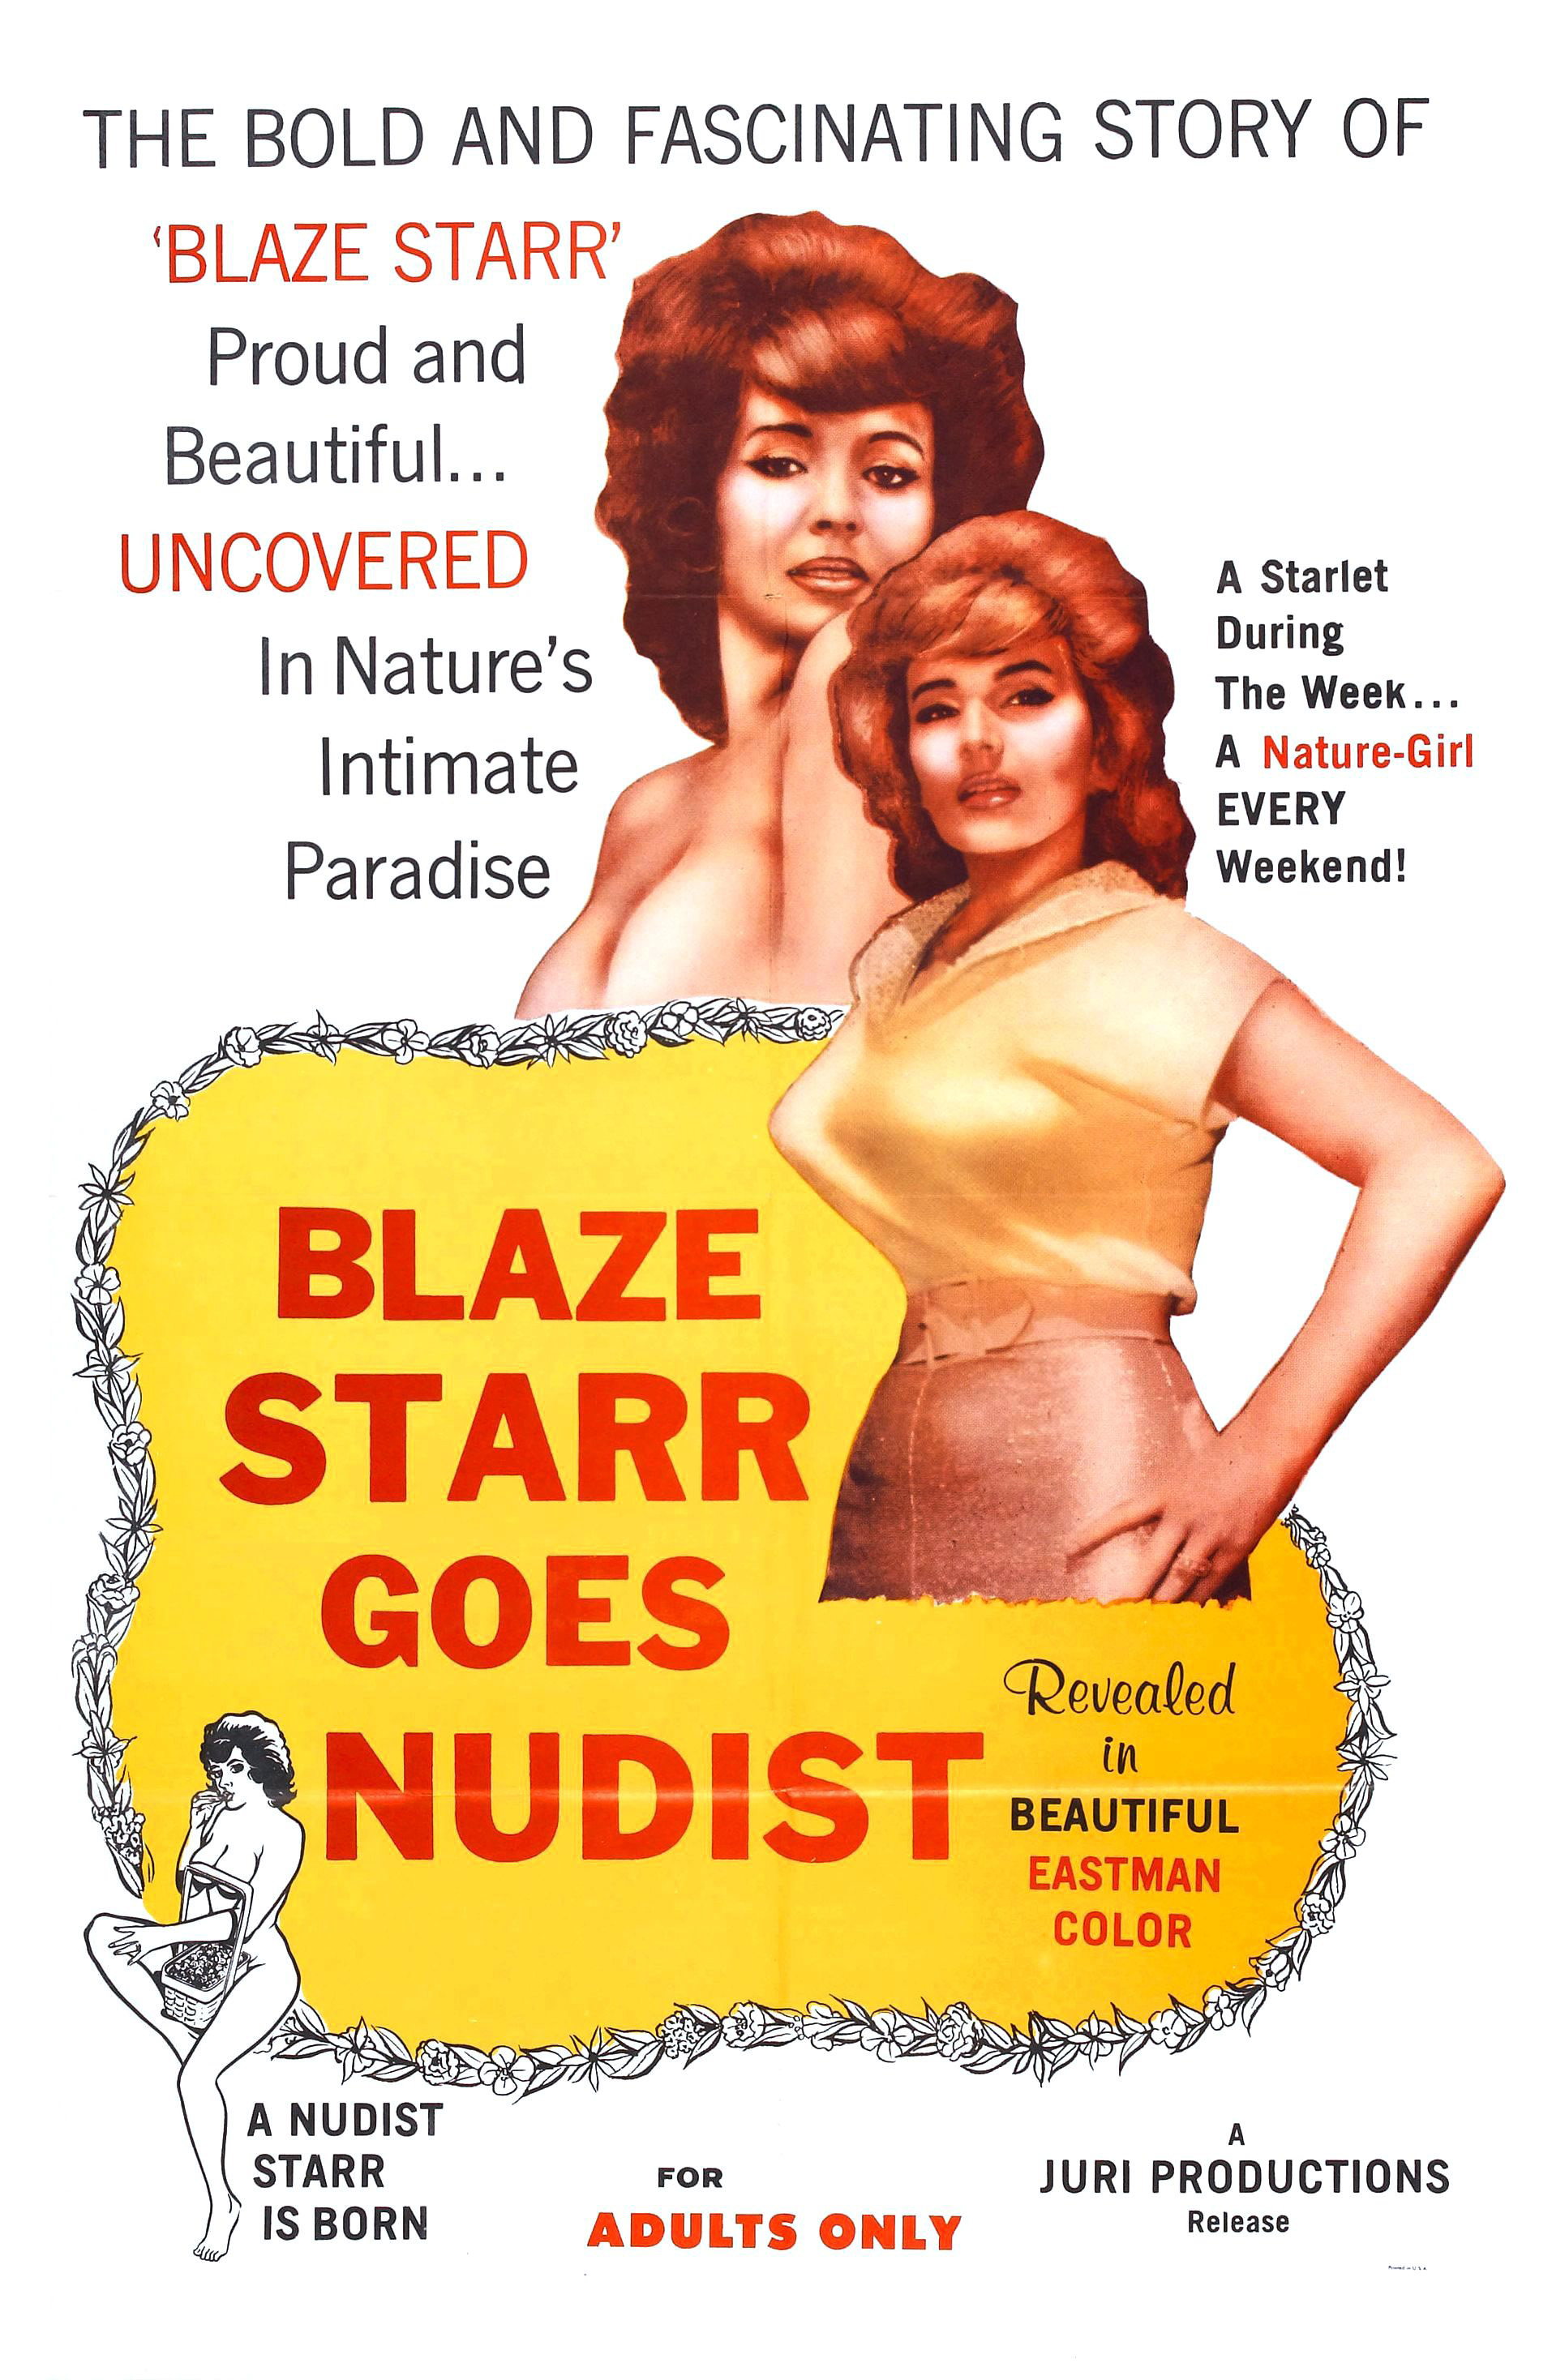 blaze_starr_goes_nudist_poster_01.jpg